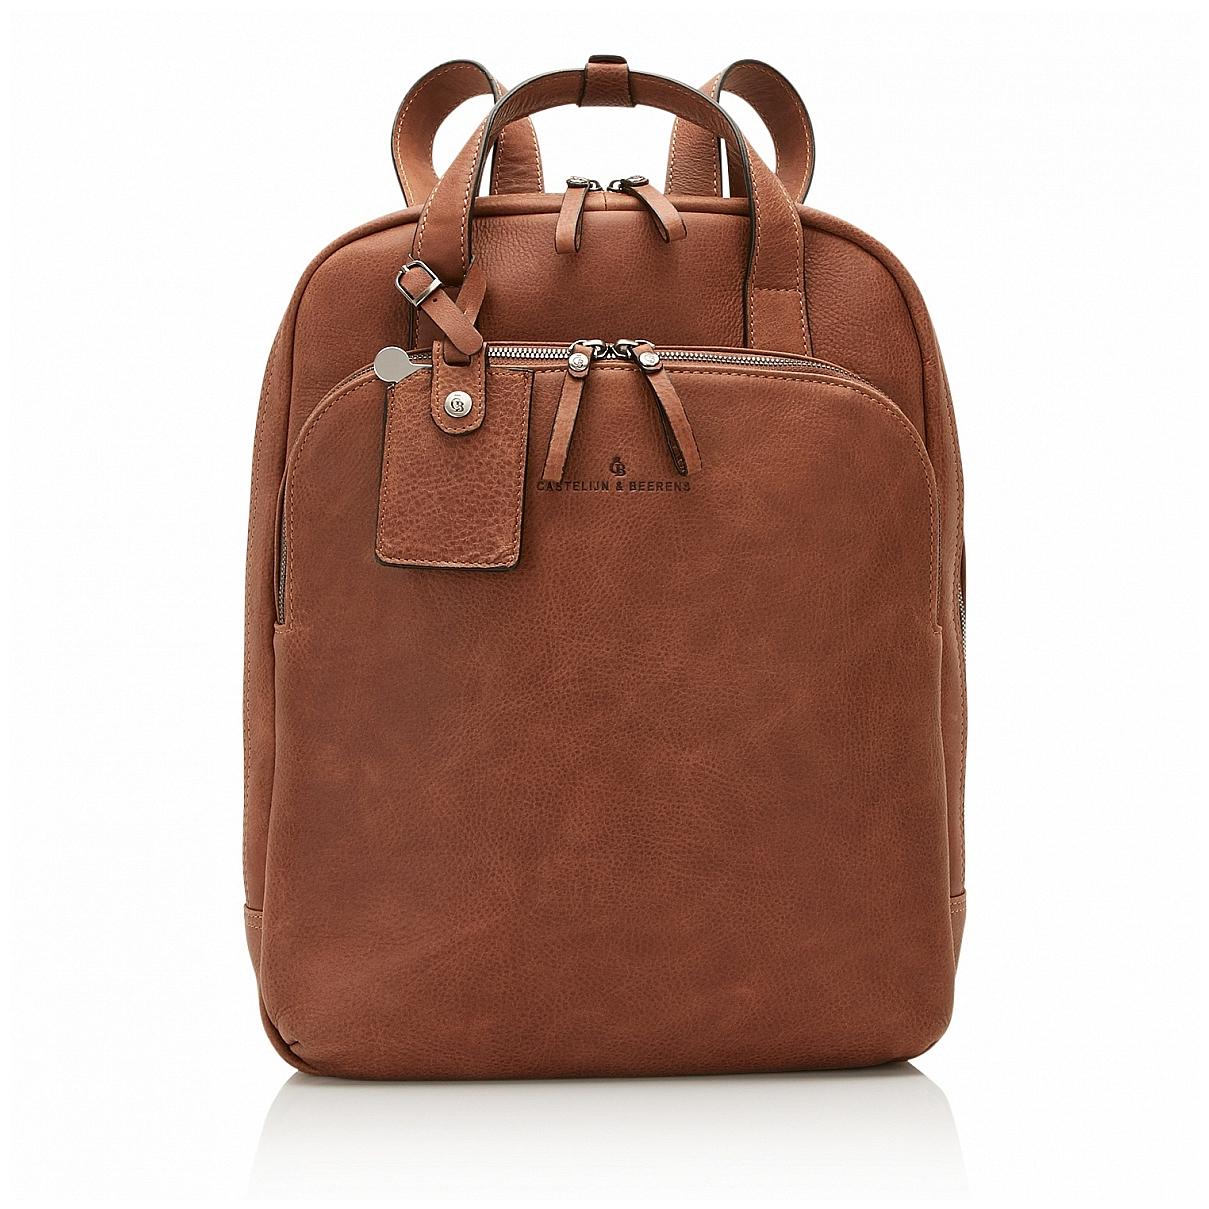 Castelijn & Beerens Elegantní kožený batoh na notebook 729577 koňak